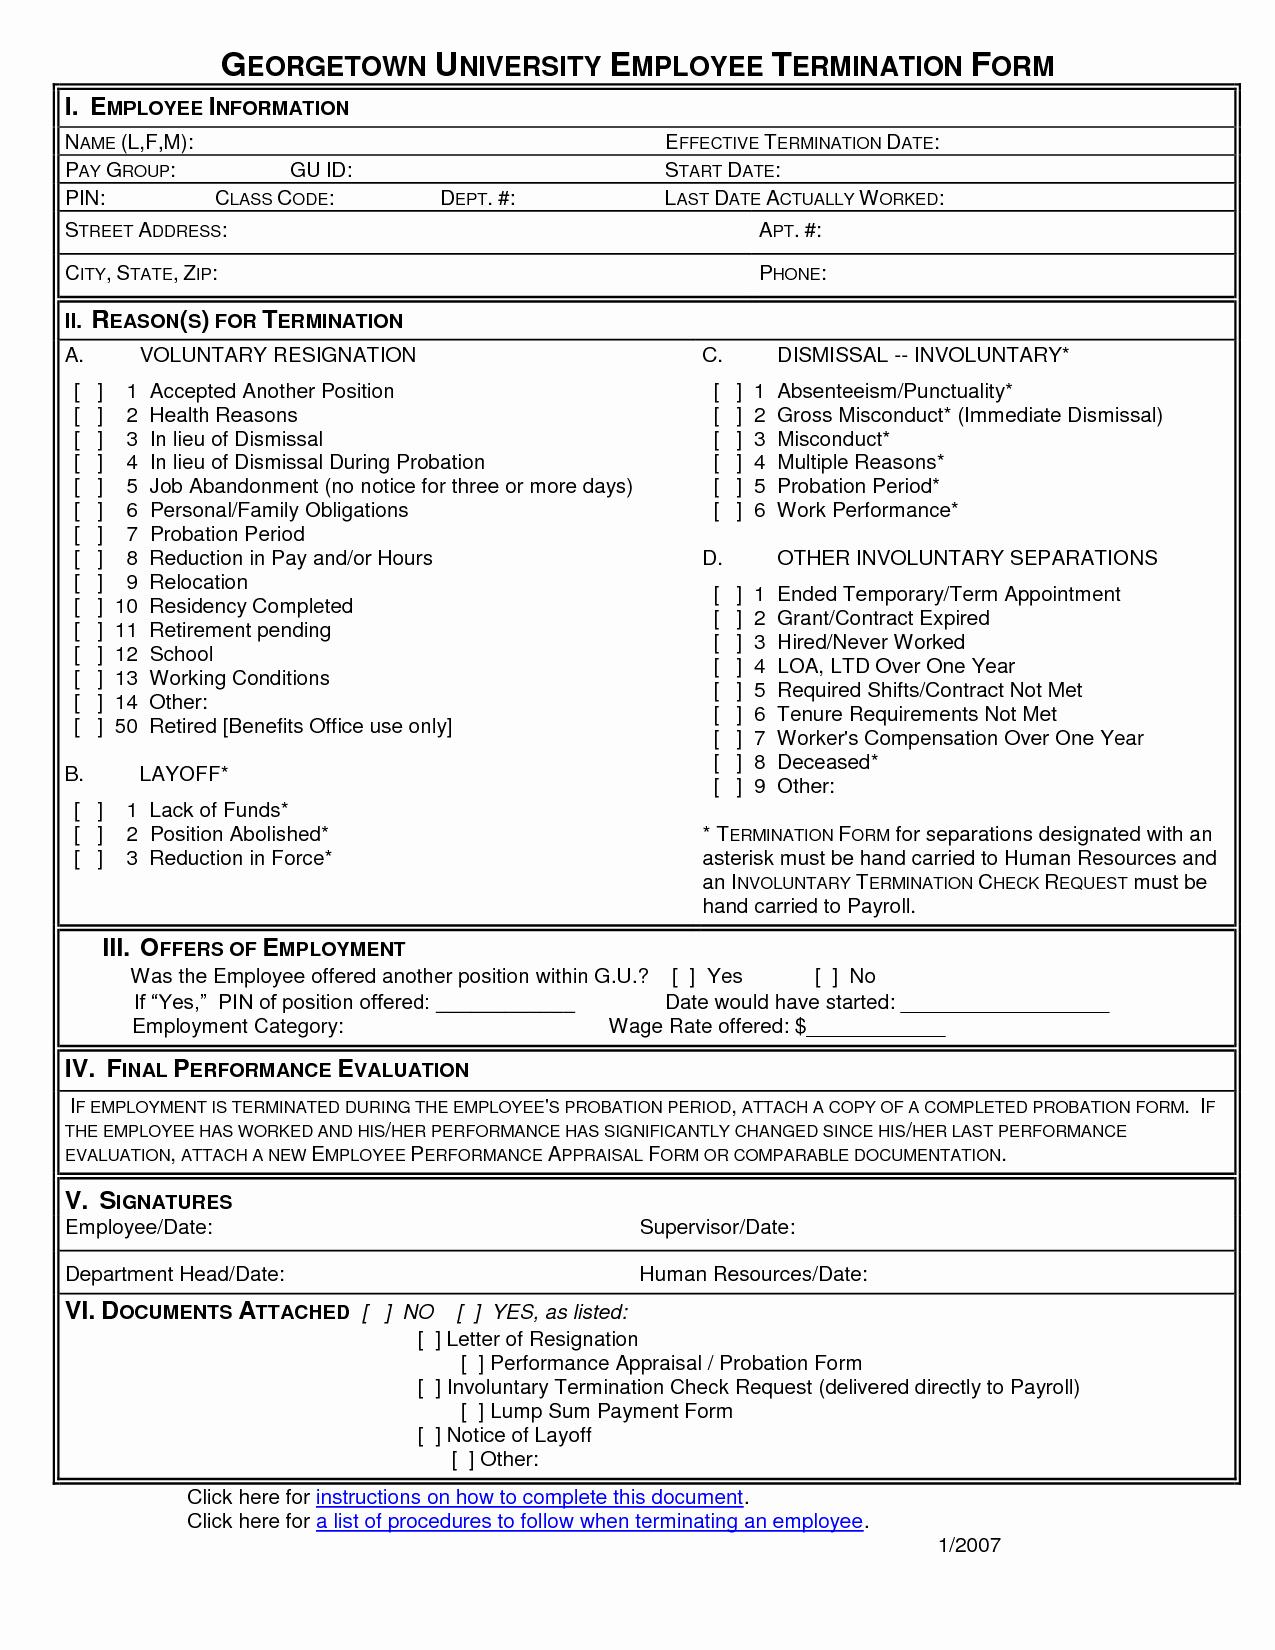 Employee Separation form Template Elegant Employee Employee Termination form Picture Employee